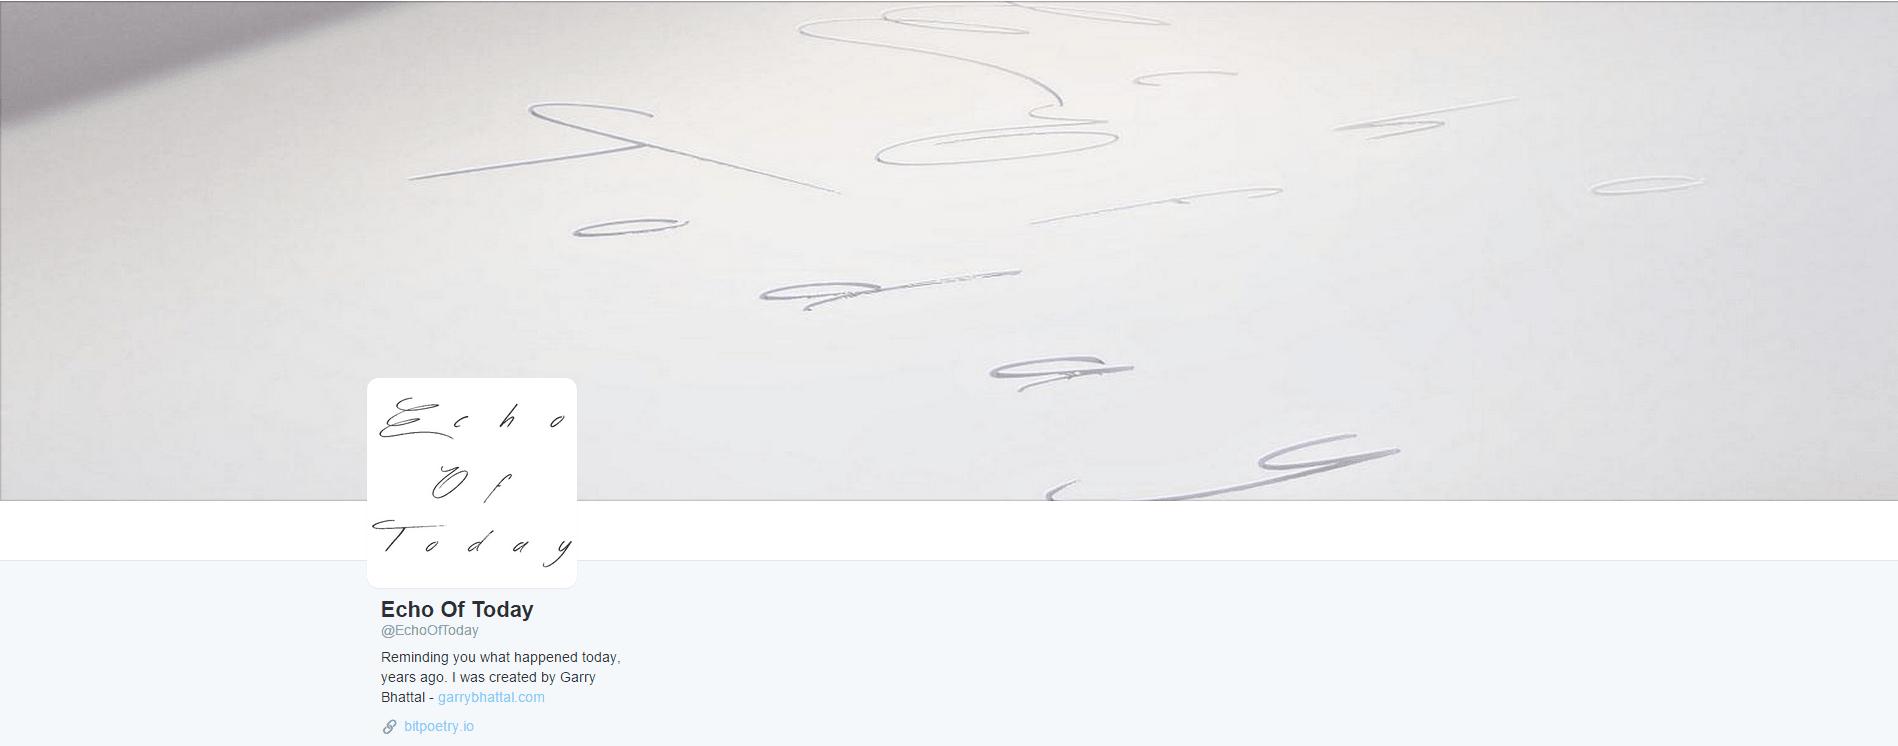 twitter profile screenshot